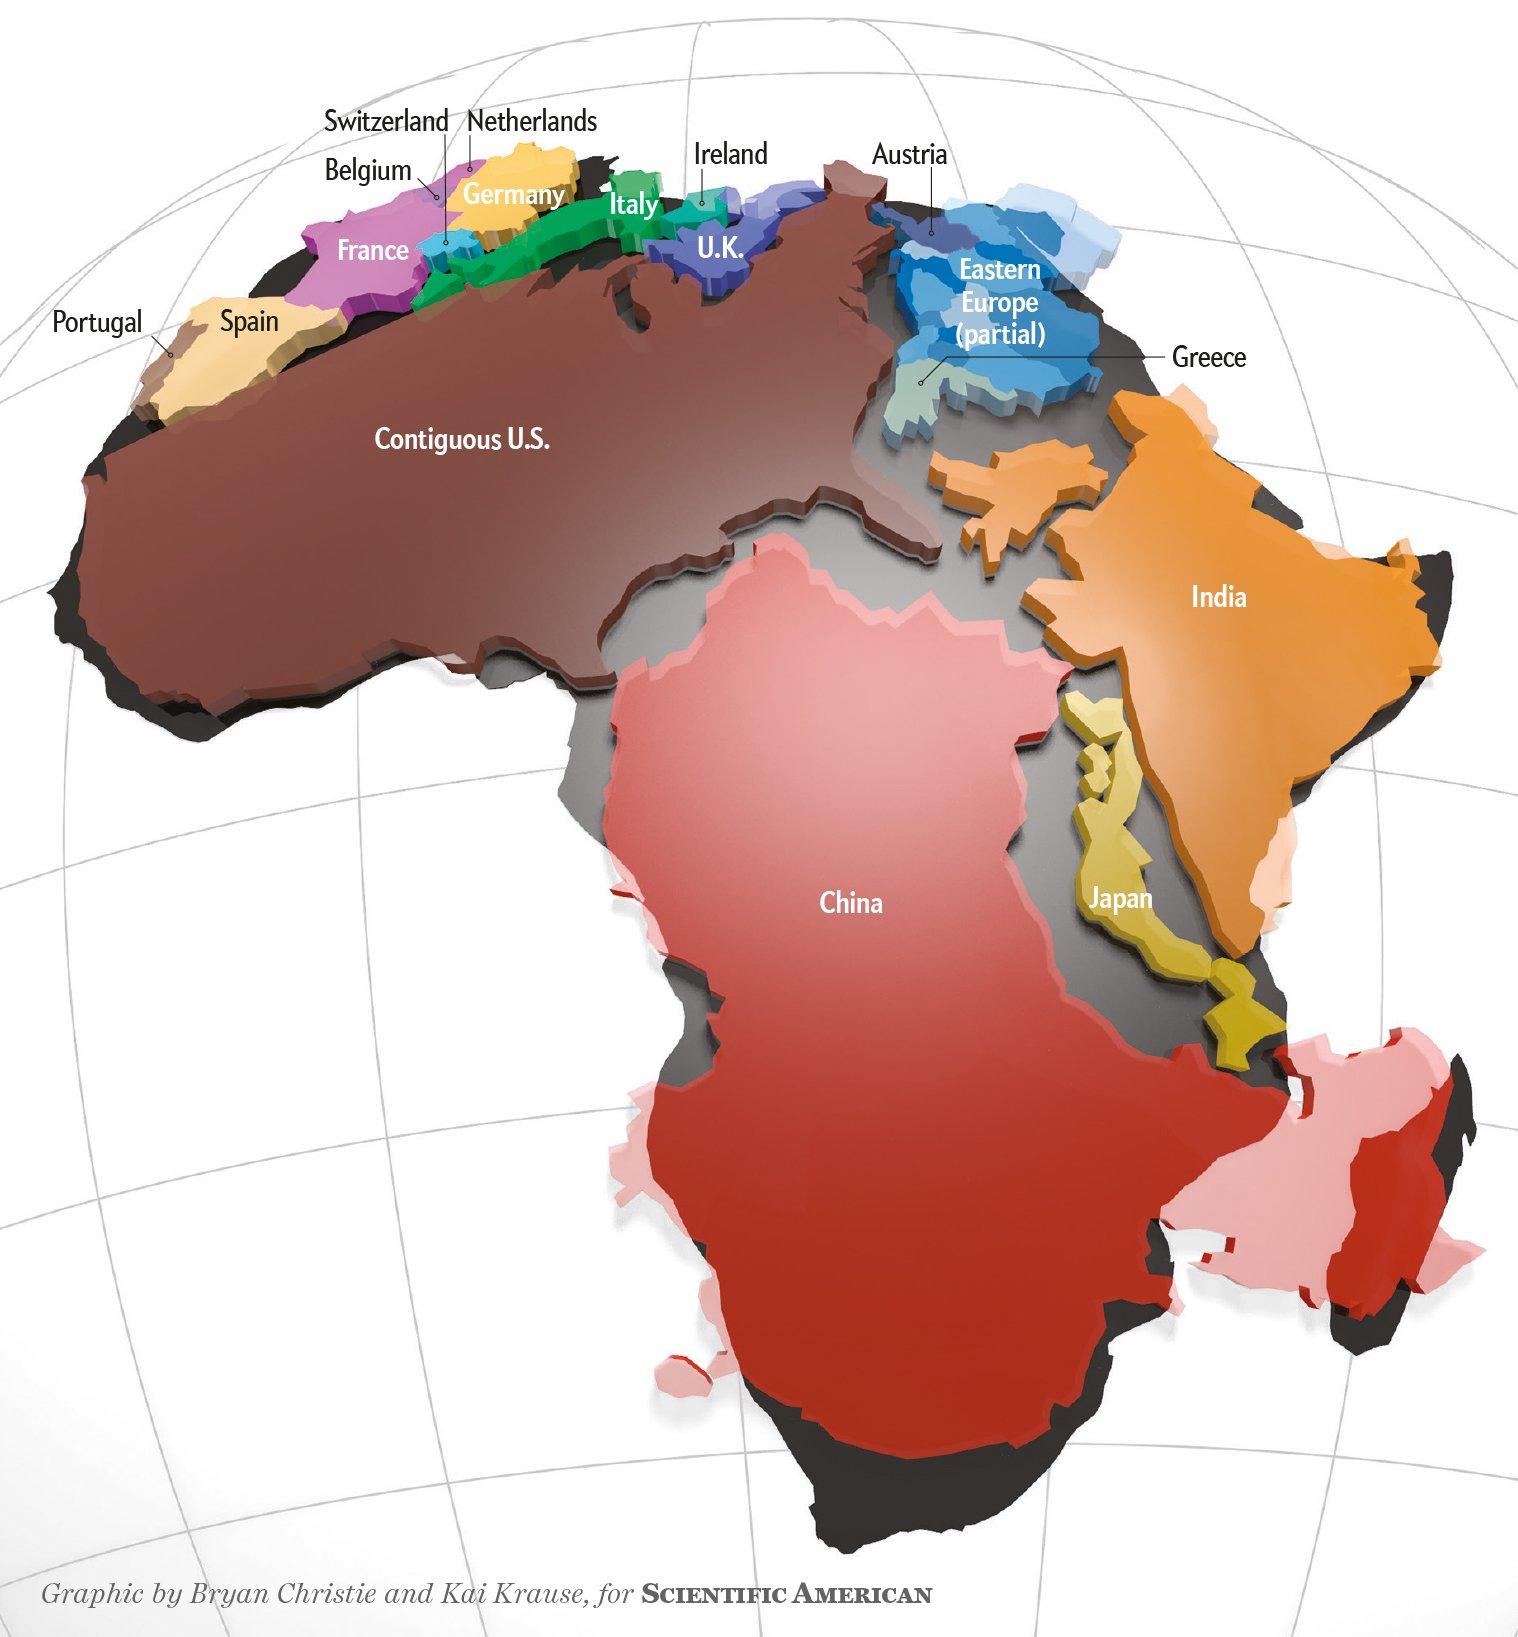 Safari-Travel-Insurance-Massive-Continent | AardvarkCompare.com